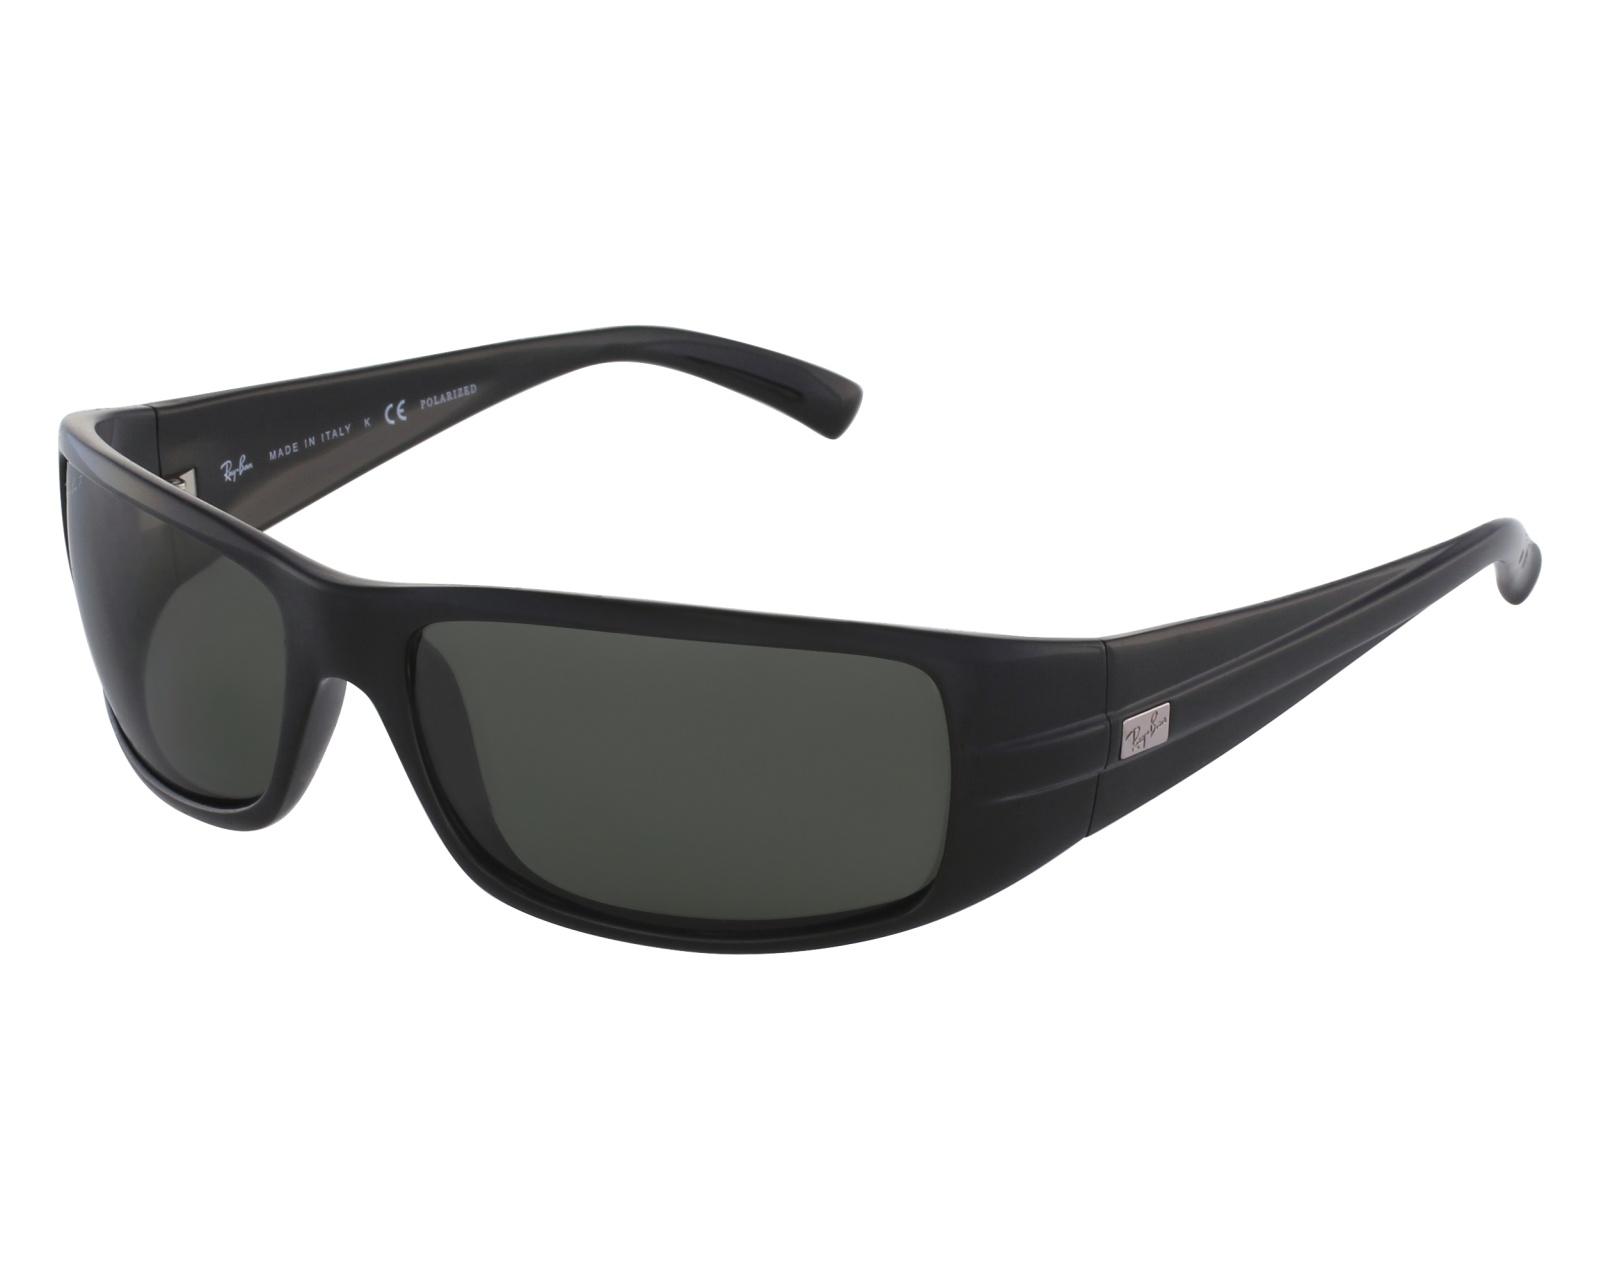 0363cfe79b6 thumbnail Sunglasses Ray-Ban RB-4057 601 58 - Black front view